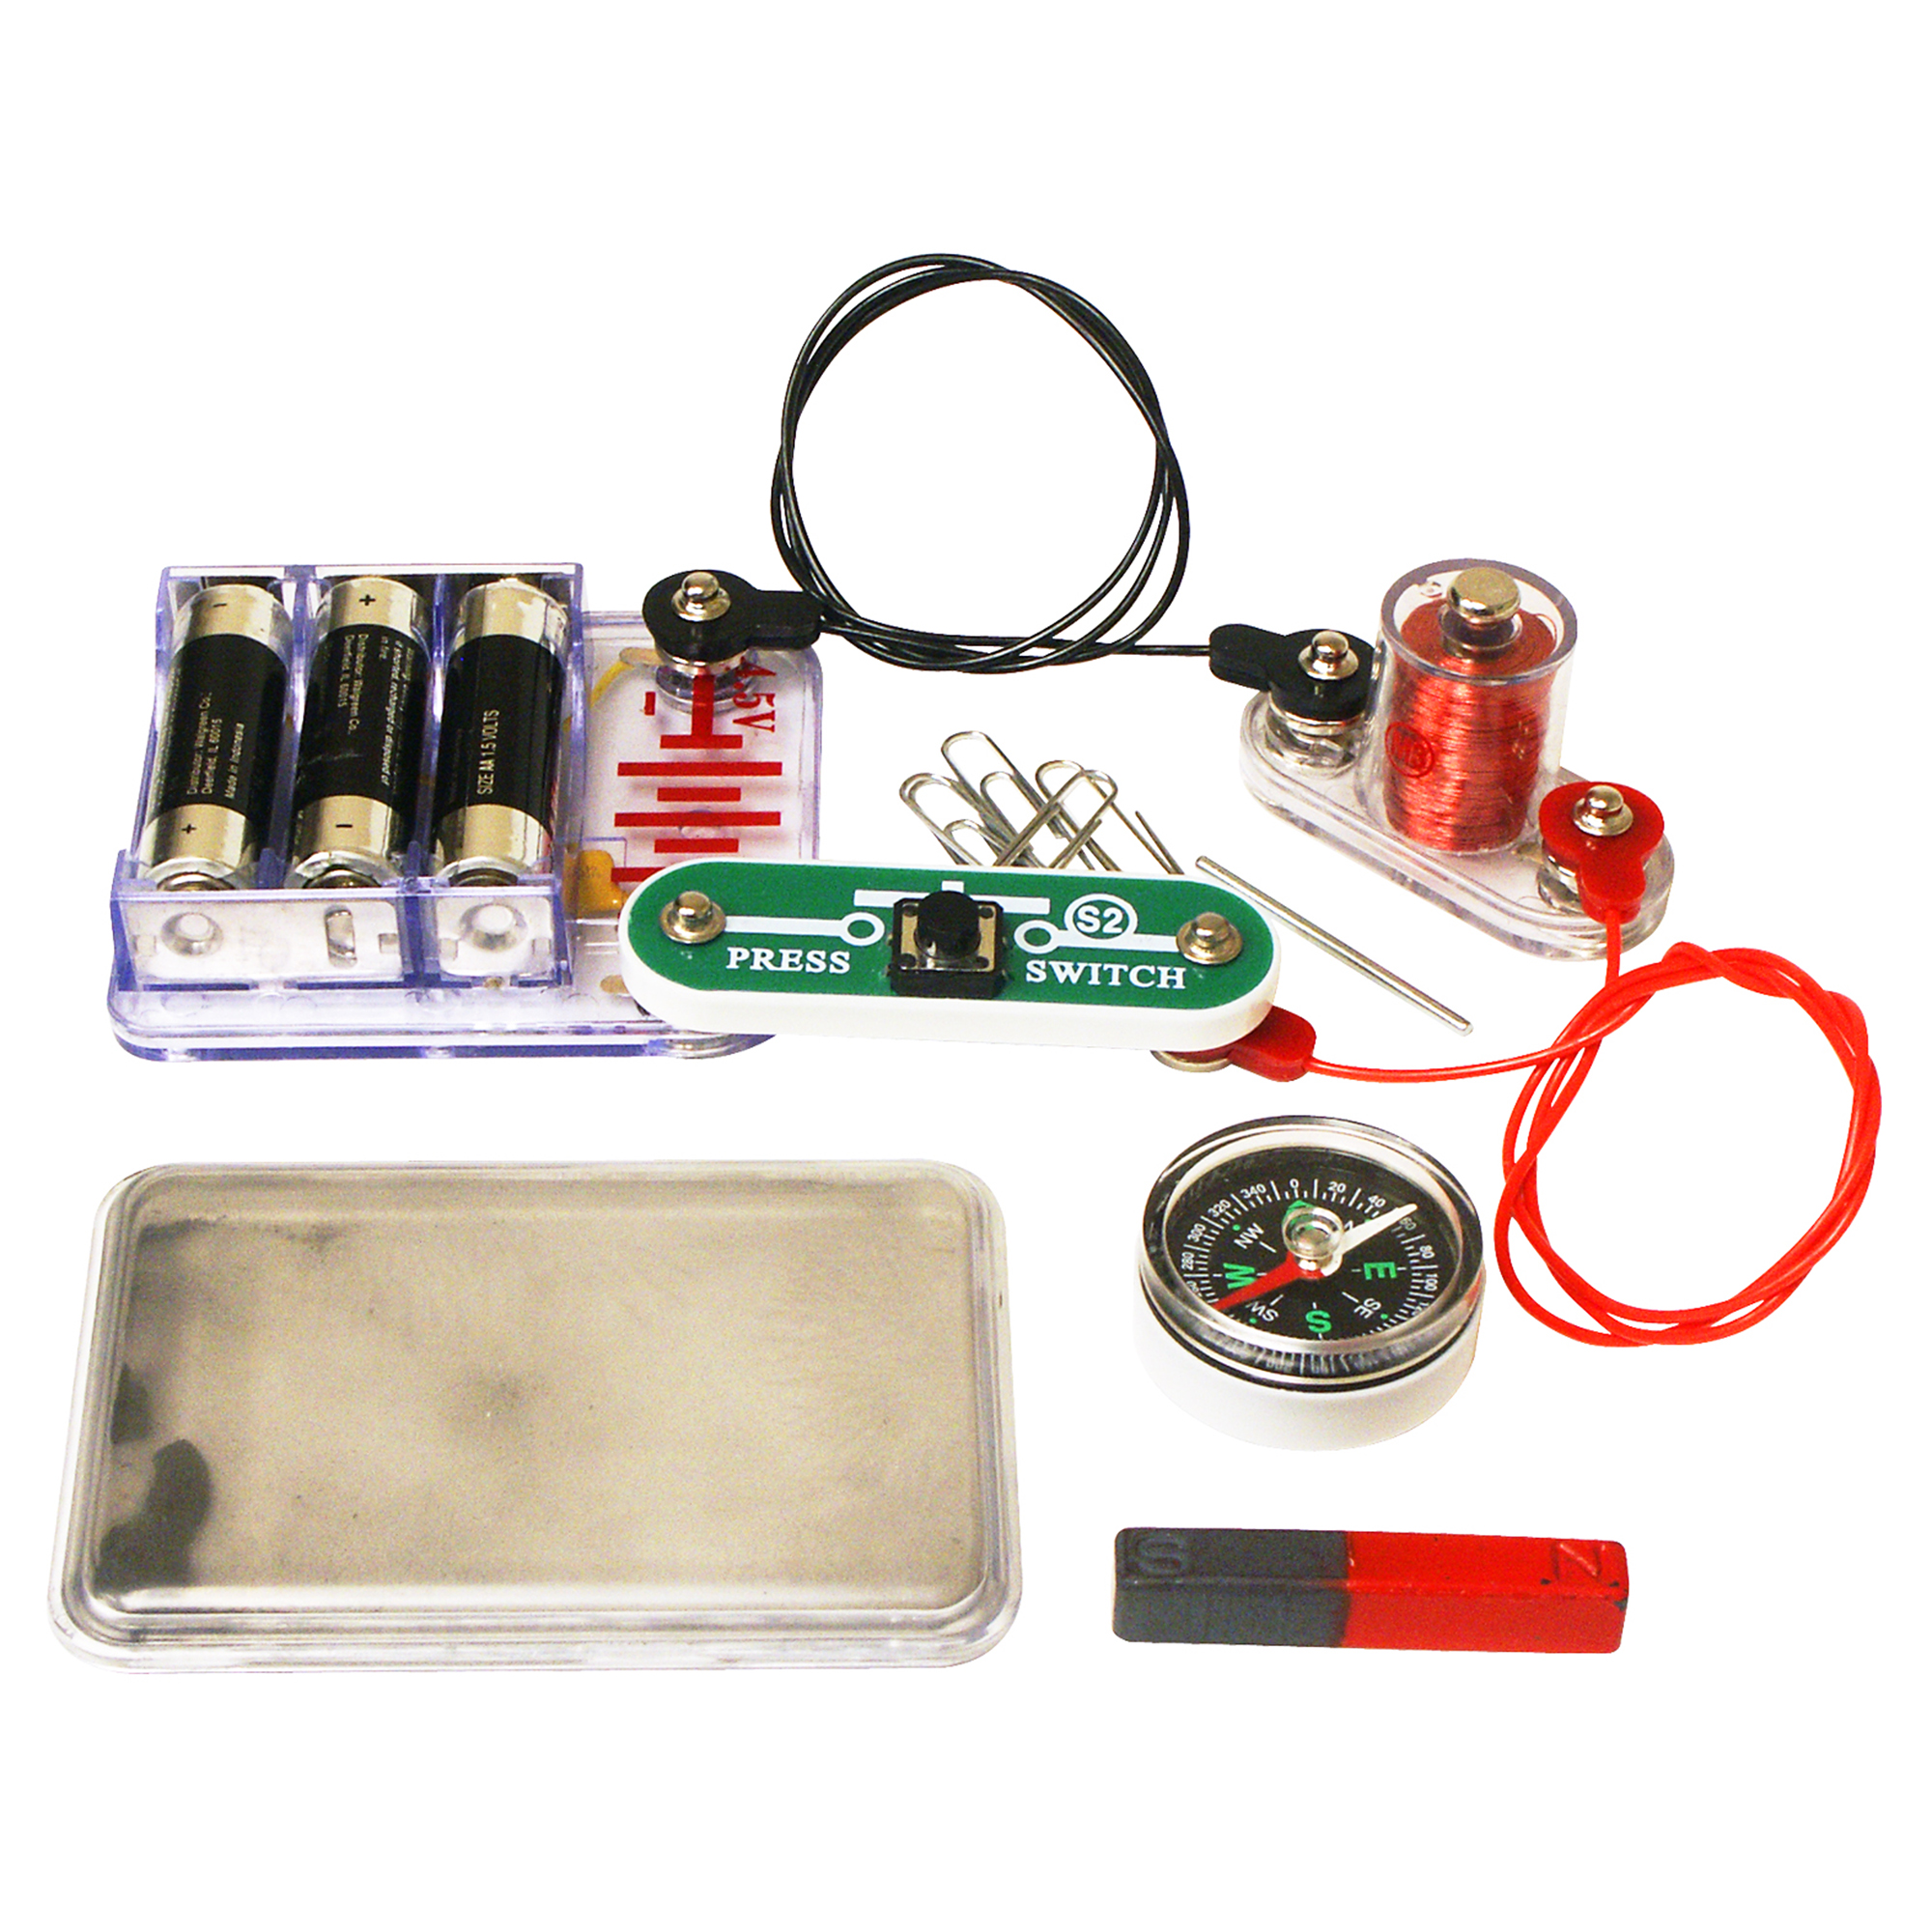 Snap Circuits Electromagnetism Elenco Home Previous Next